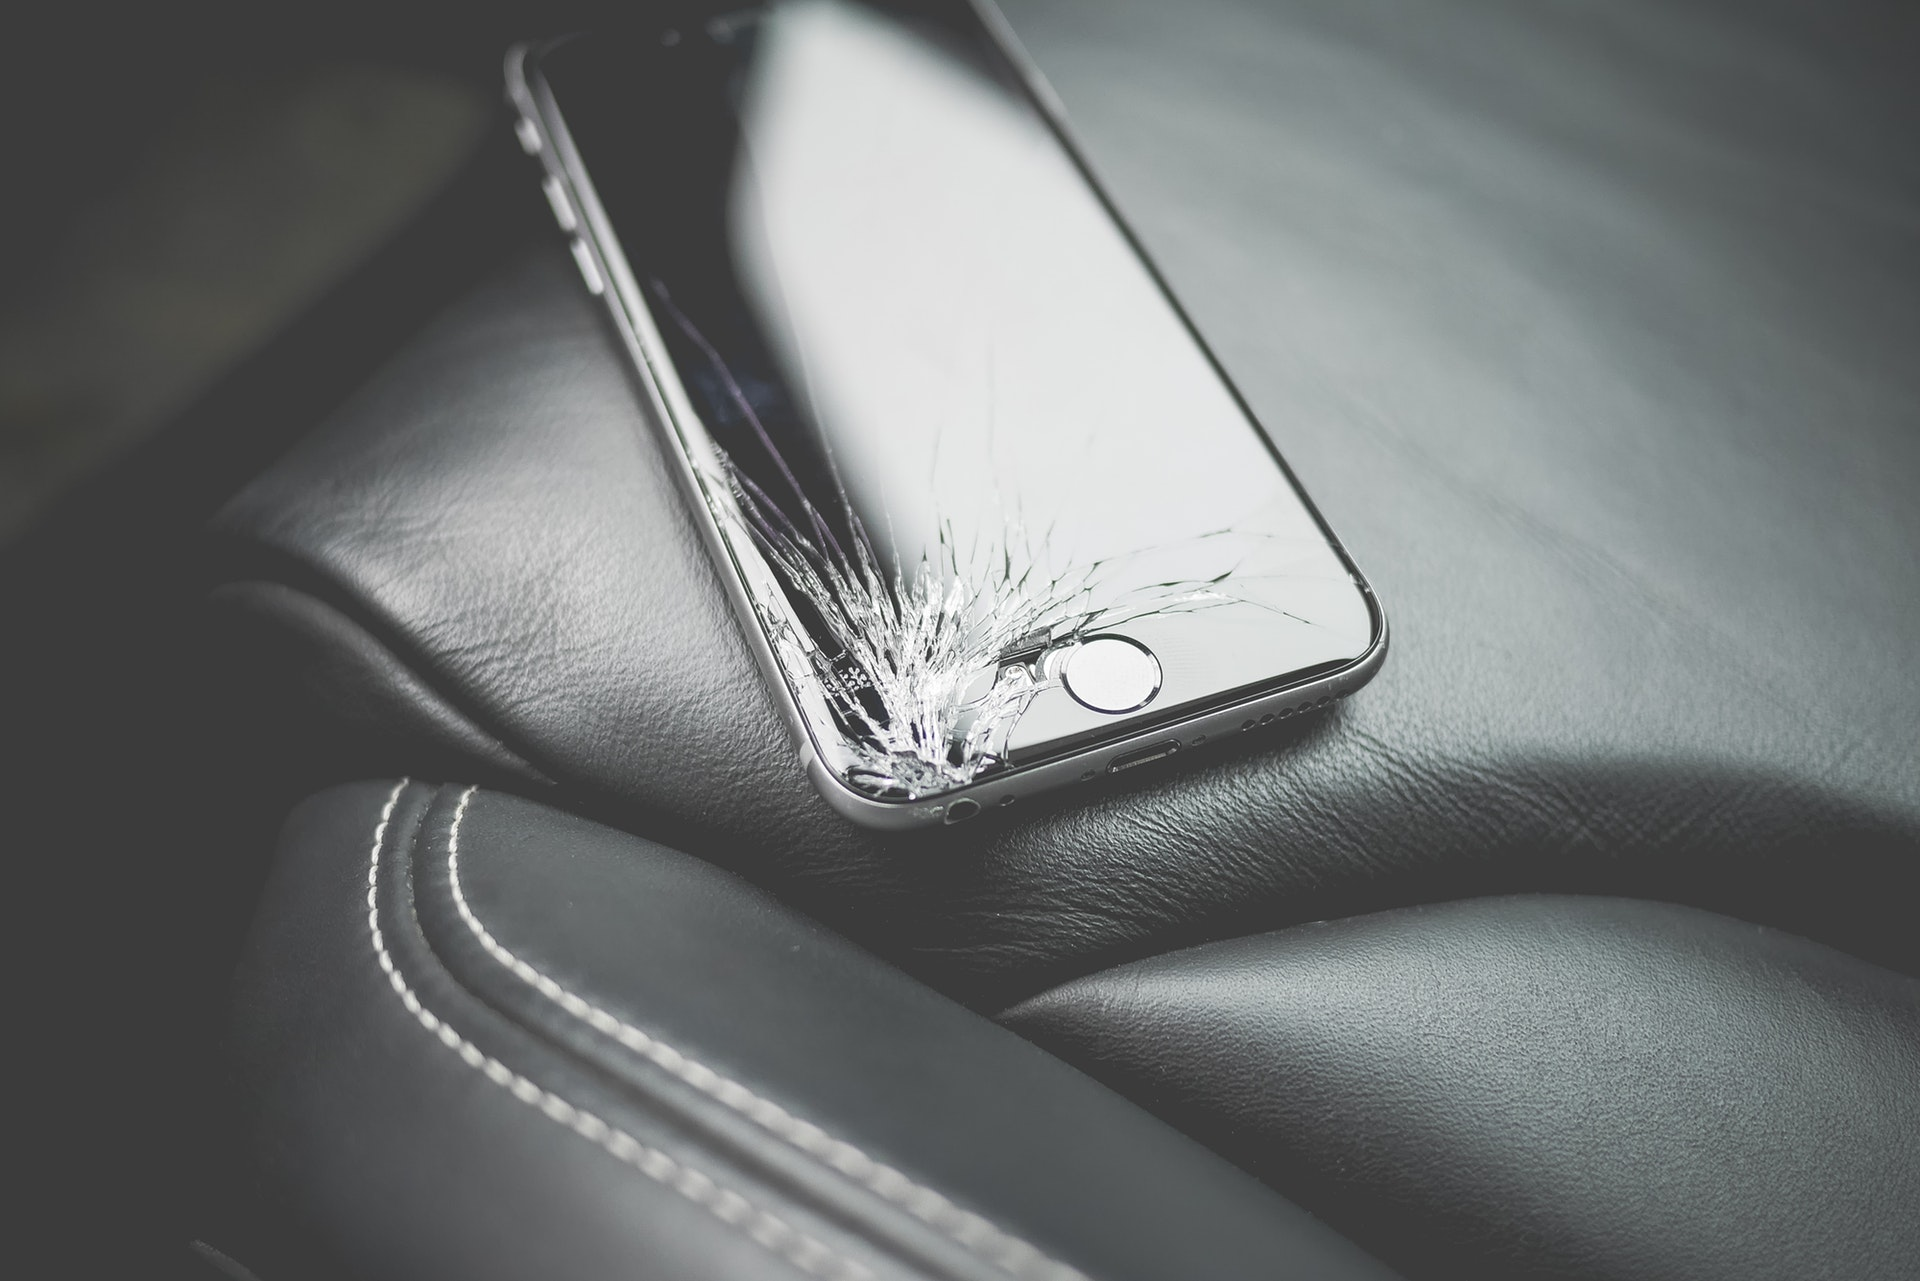 iPhone故障時の対処法と修理業者|水没・画面割れなど